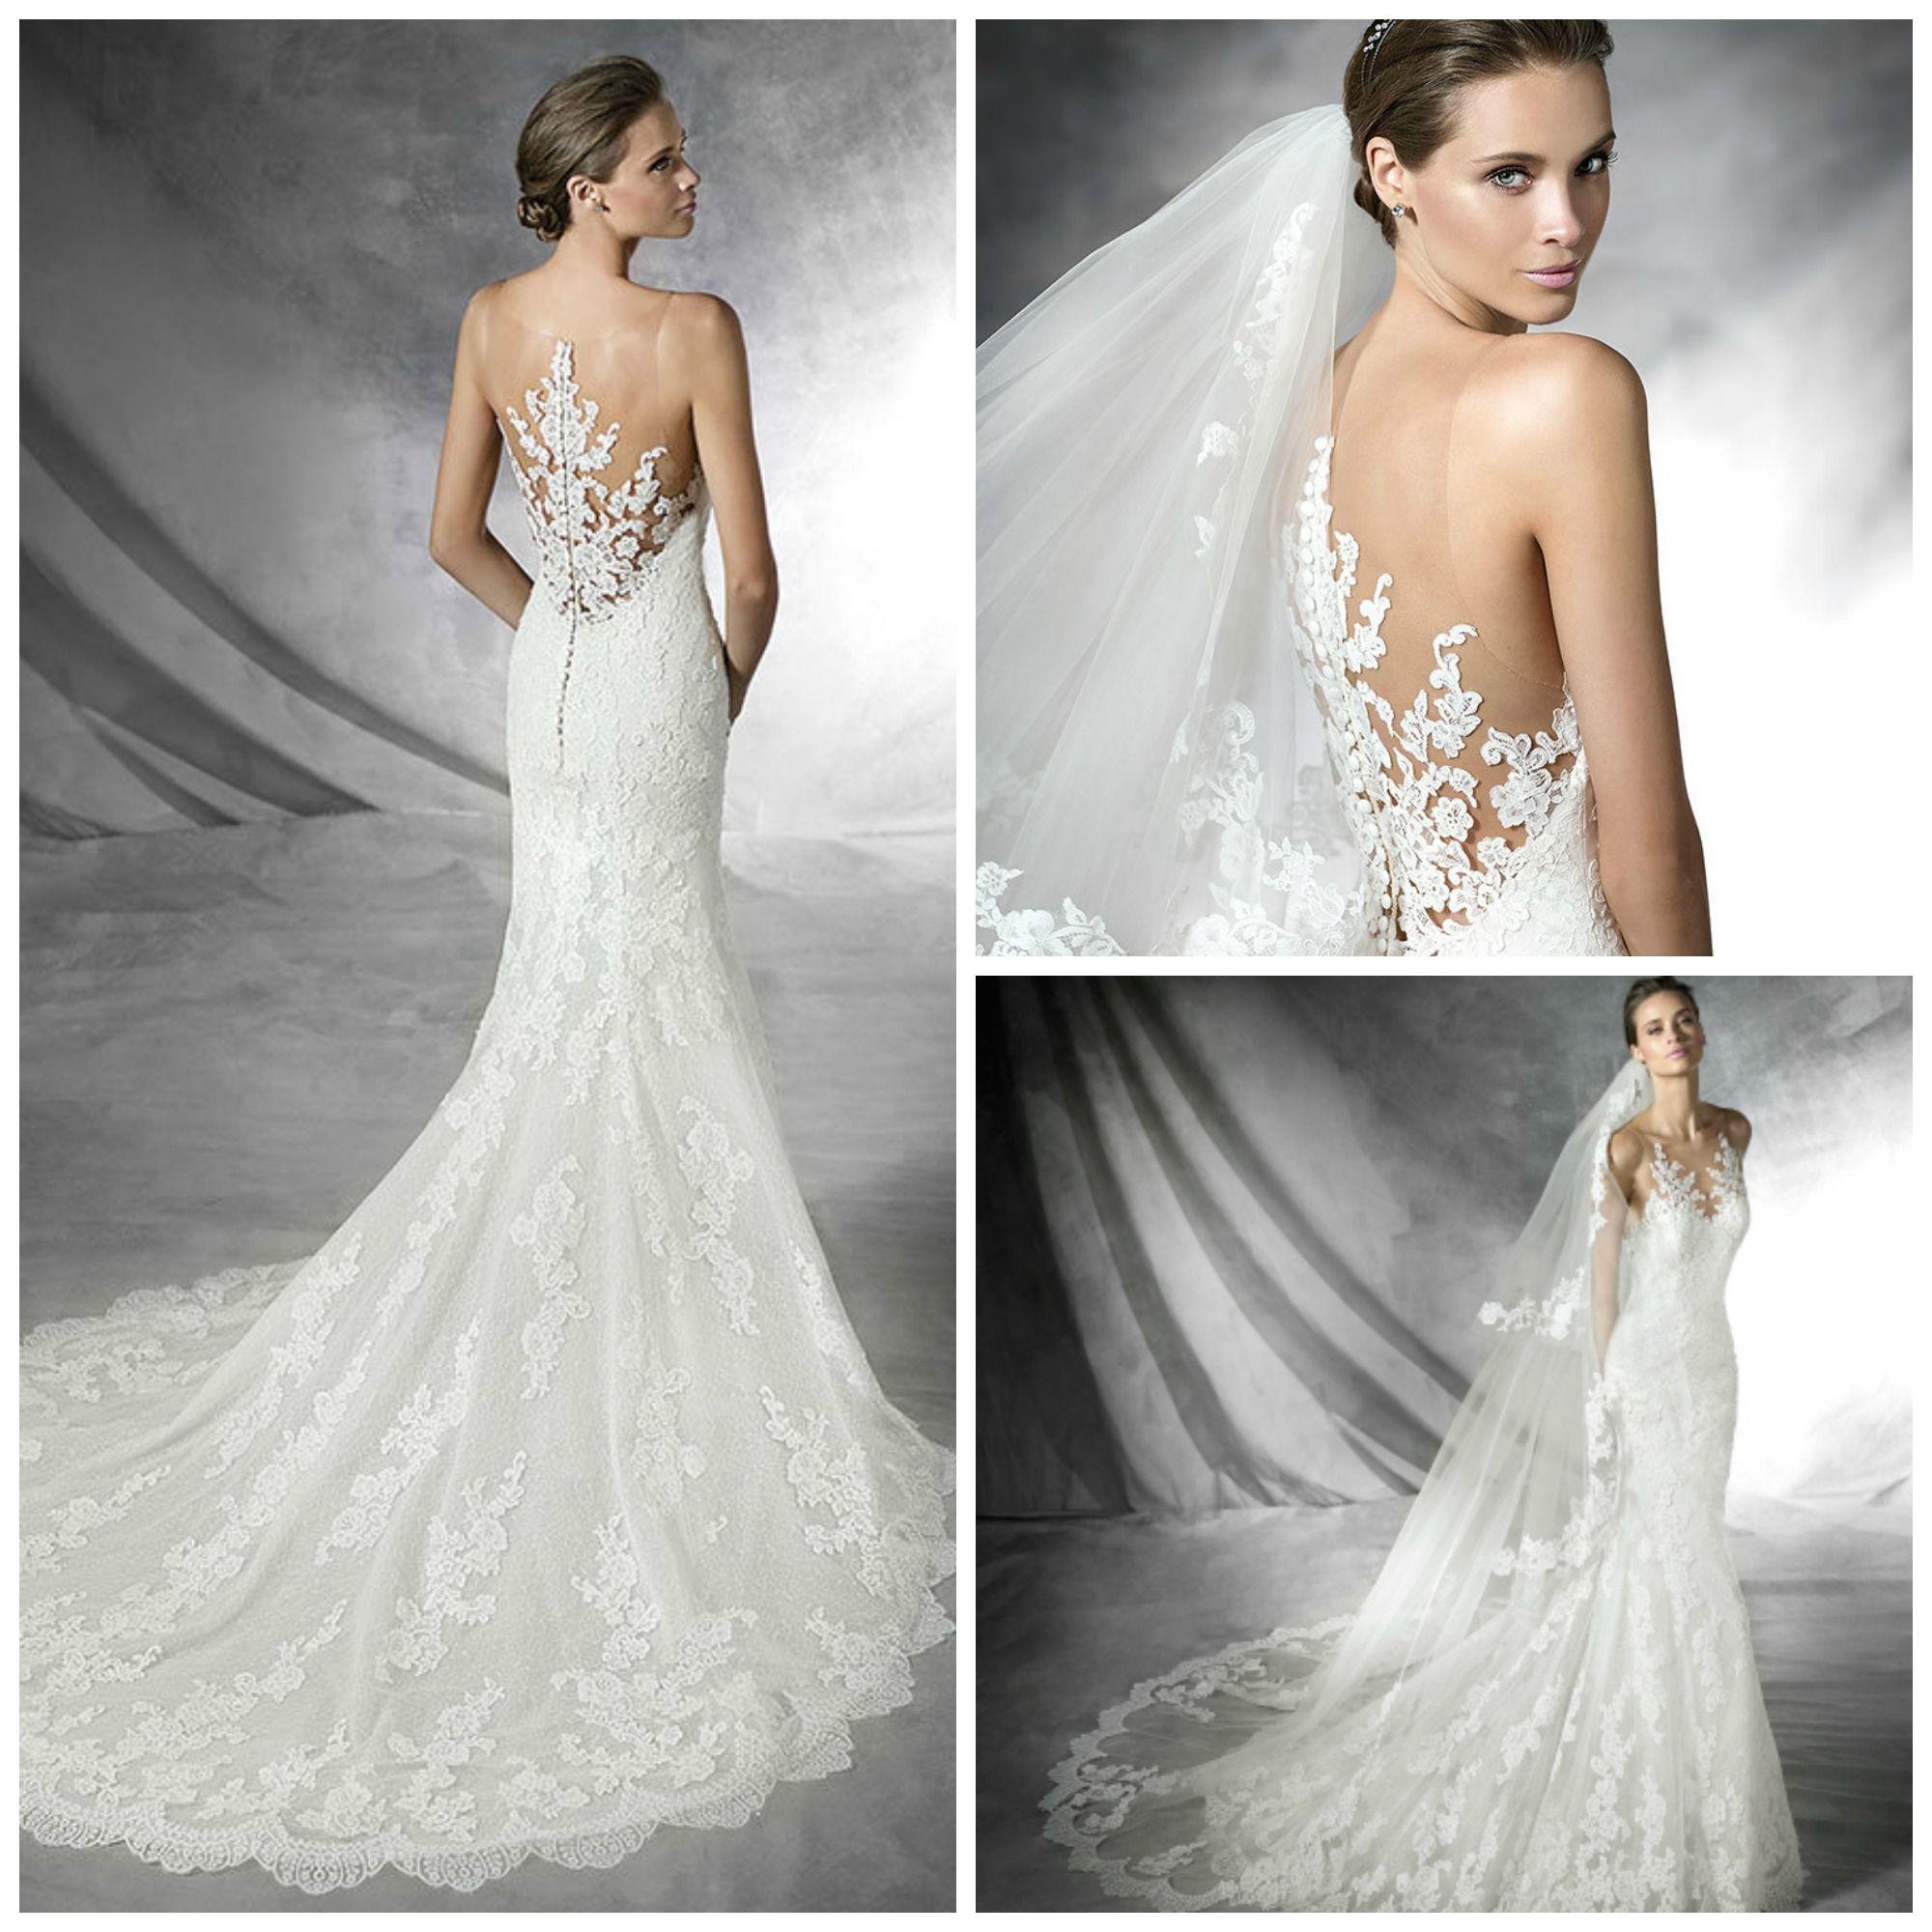 Pronovias 2016 - Placia Wedding Dress (4) - Confetti.co.uk | Bridal ...